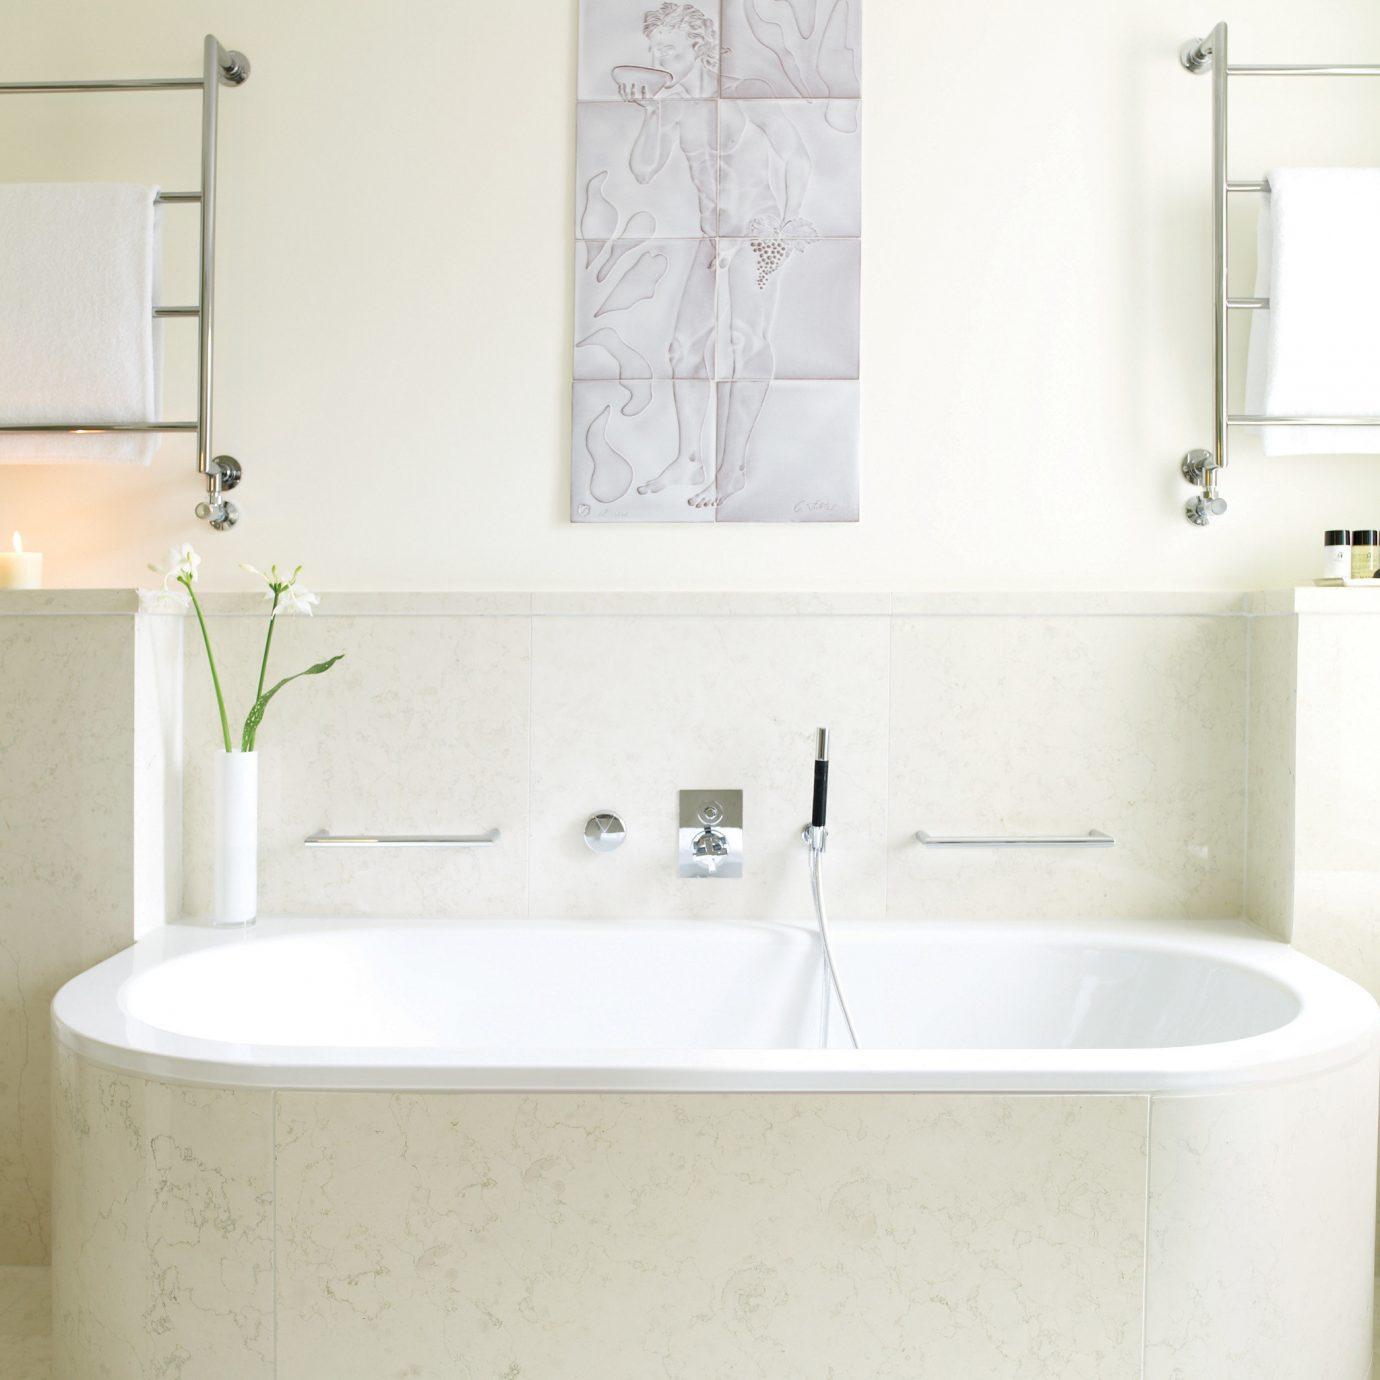 bathroom white vessel bathtub plumbing fixture bidet toilet sink bathroom cabinet tub flooring Bath tile water basin tiled